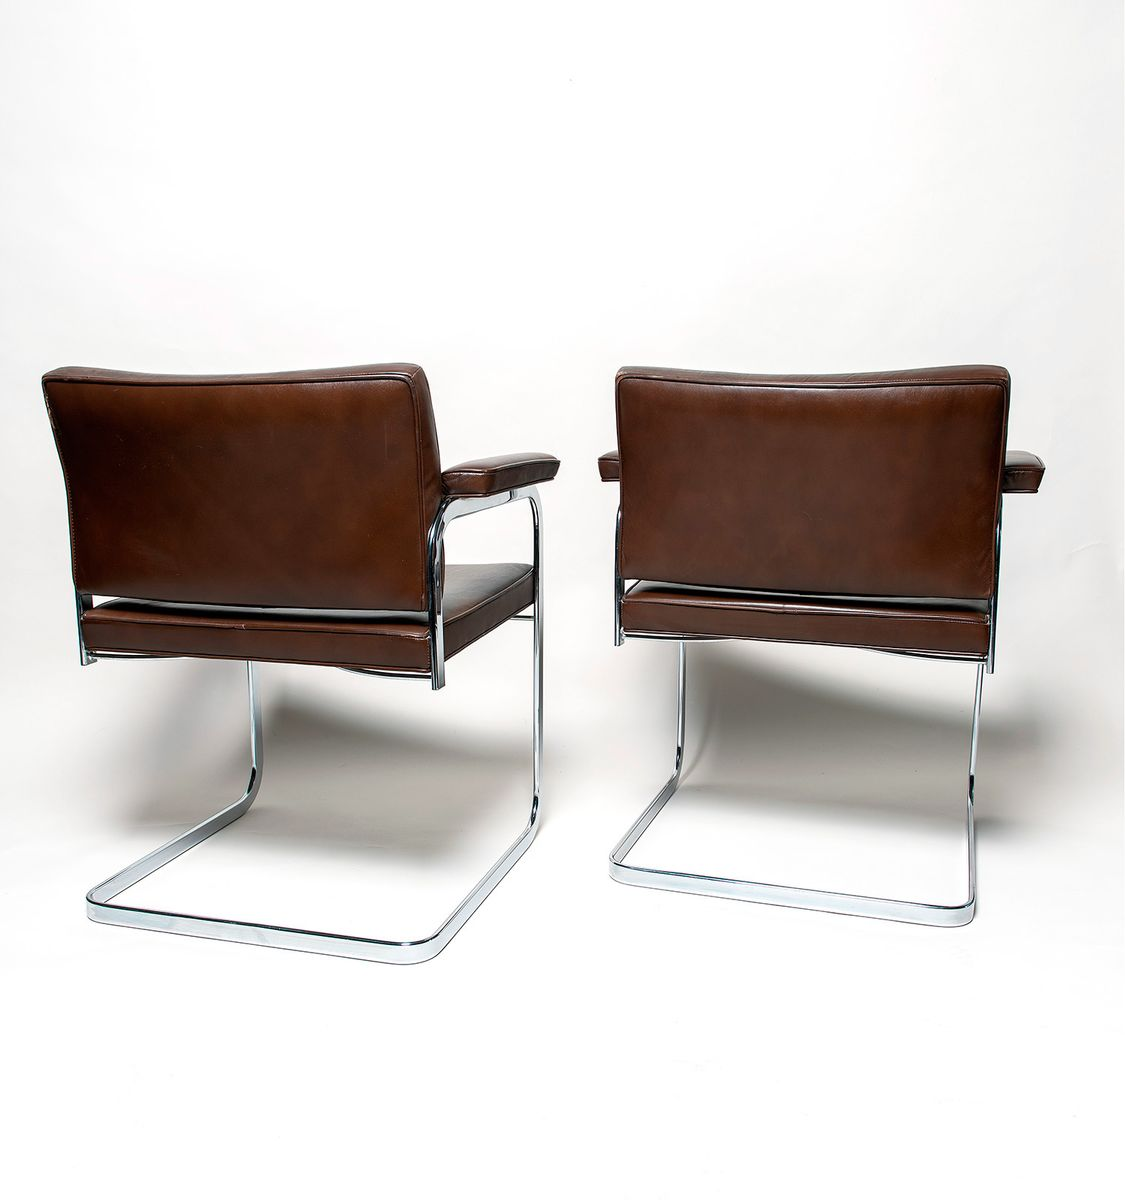 bauhaus stil epoche bauhaus stil epoche bauhaus 1979 1983 wikipedia art deco bauhaus. Black Bedroom Furniture Sets. Home Design Ideas